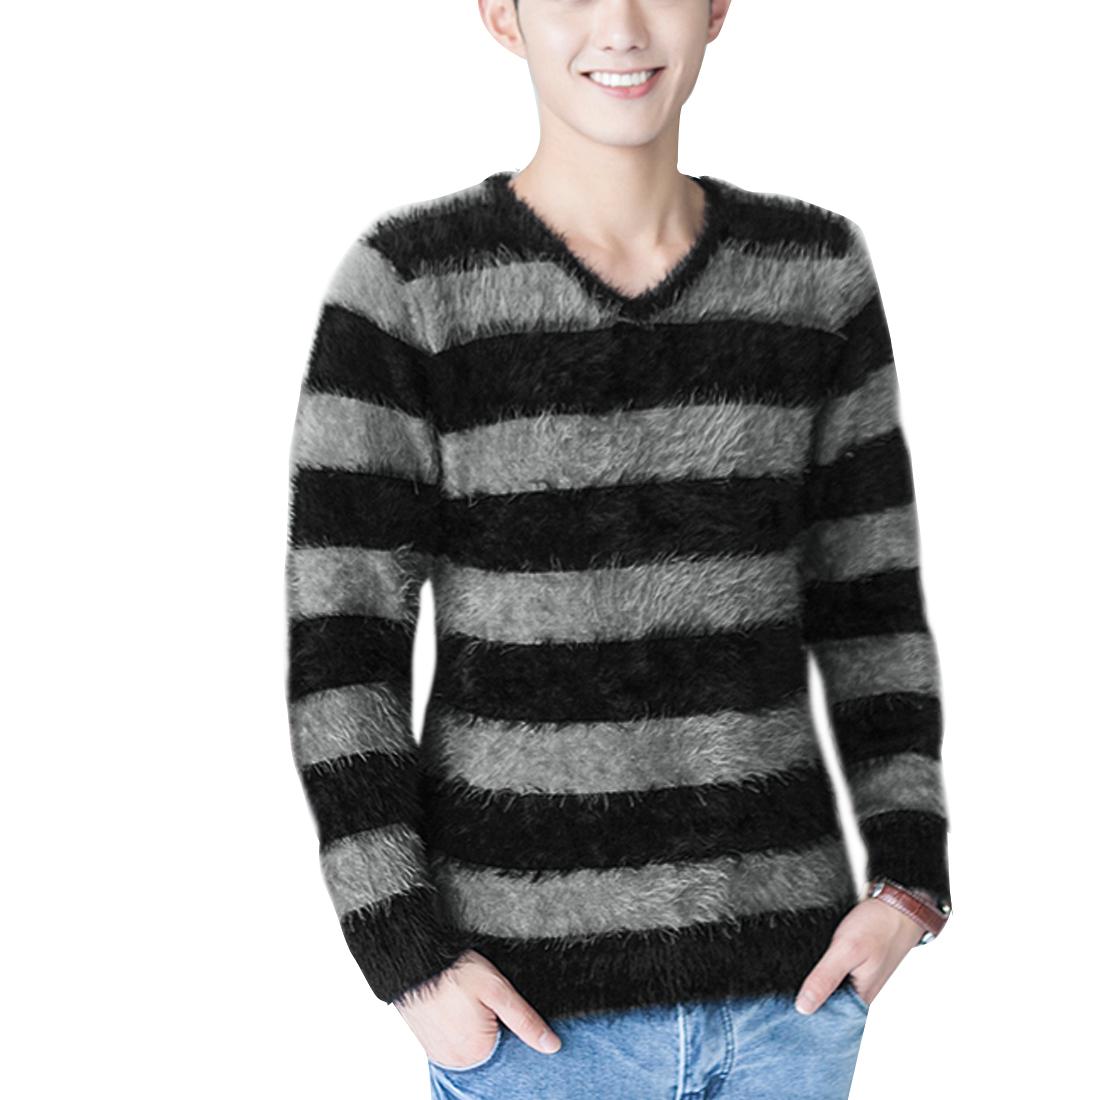 Men Pullover Long Sleeve Stripes Sweater Black Gray S